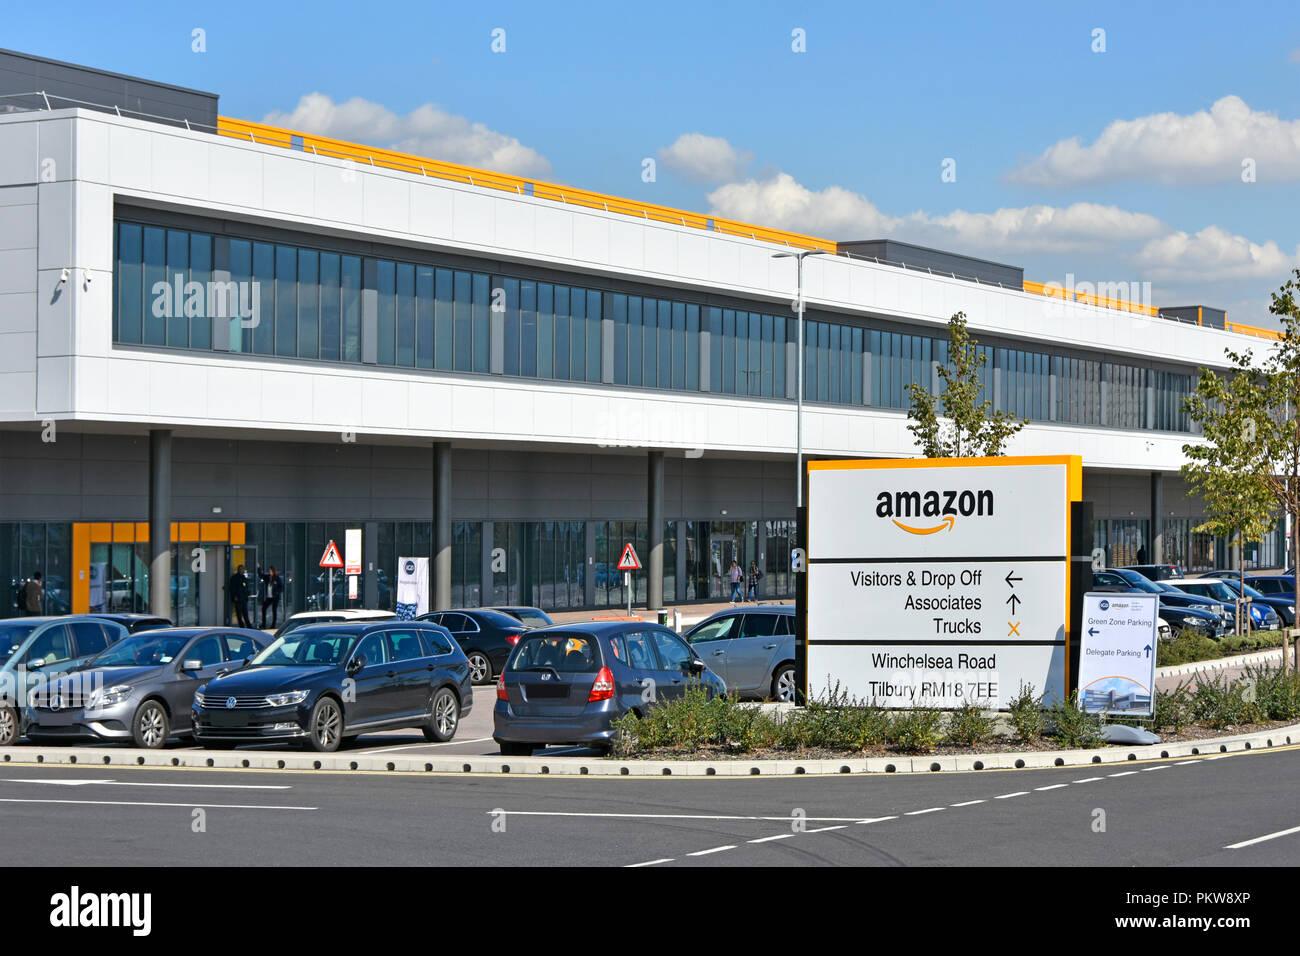 Big Amazon warehouse & distribution centre building handles online shopping retail internet & technology business development Tilbury Essex England UK - Stock Image